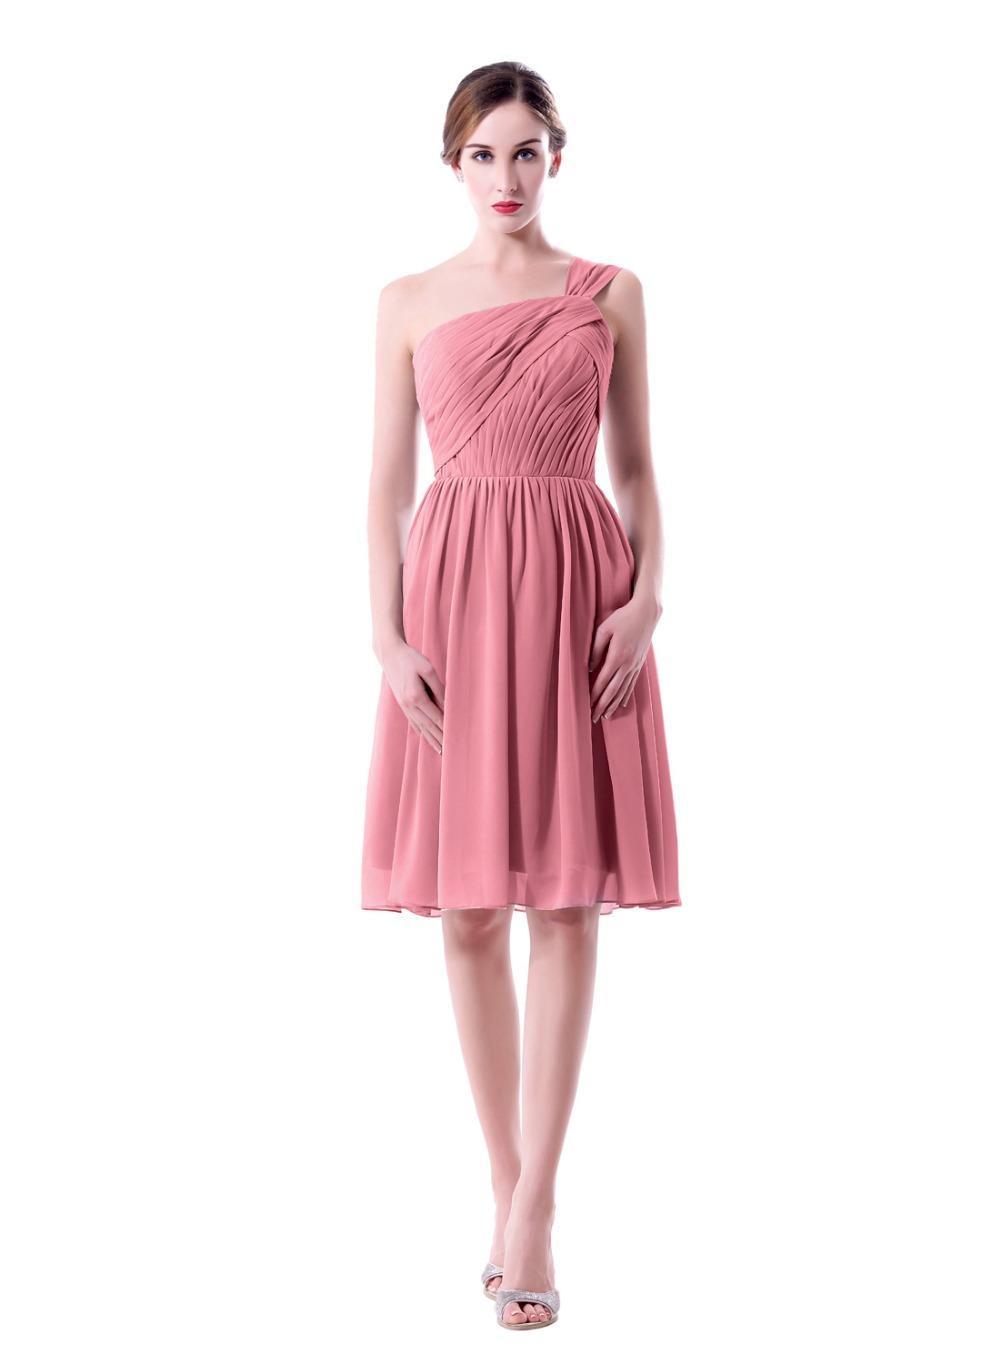 One Shoulder Knee Length Dusty Rose Bridesmaid Dress